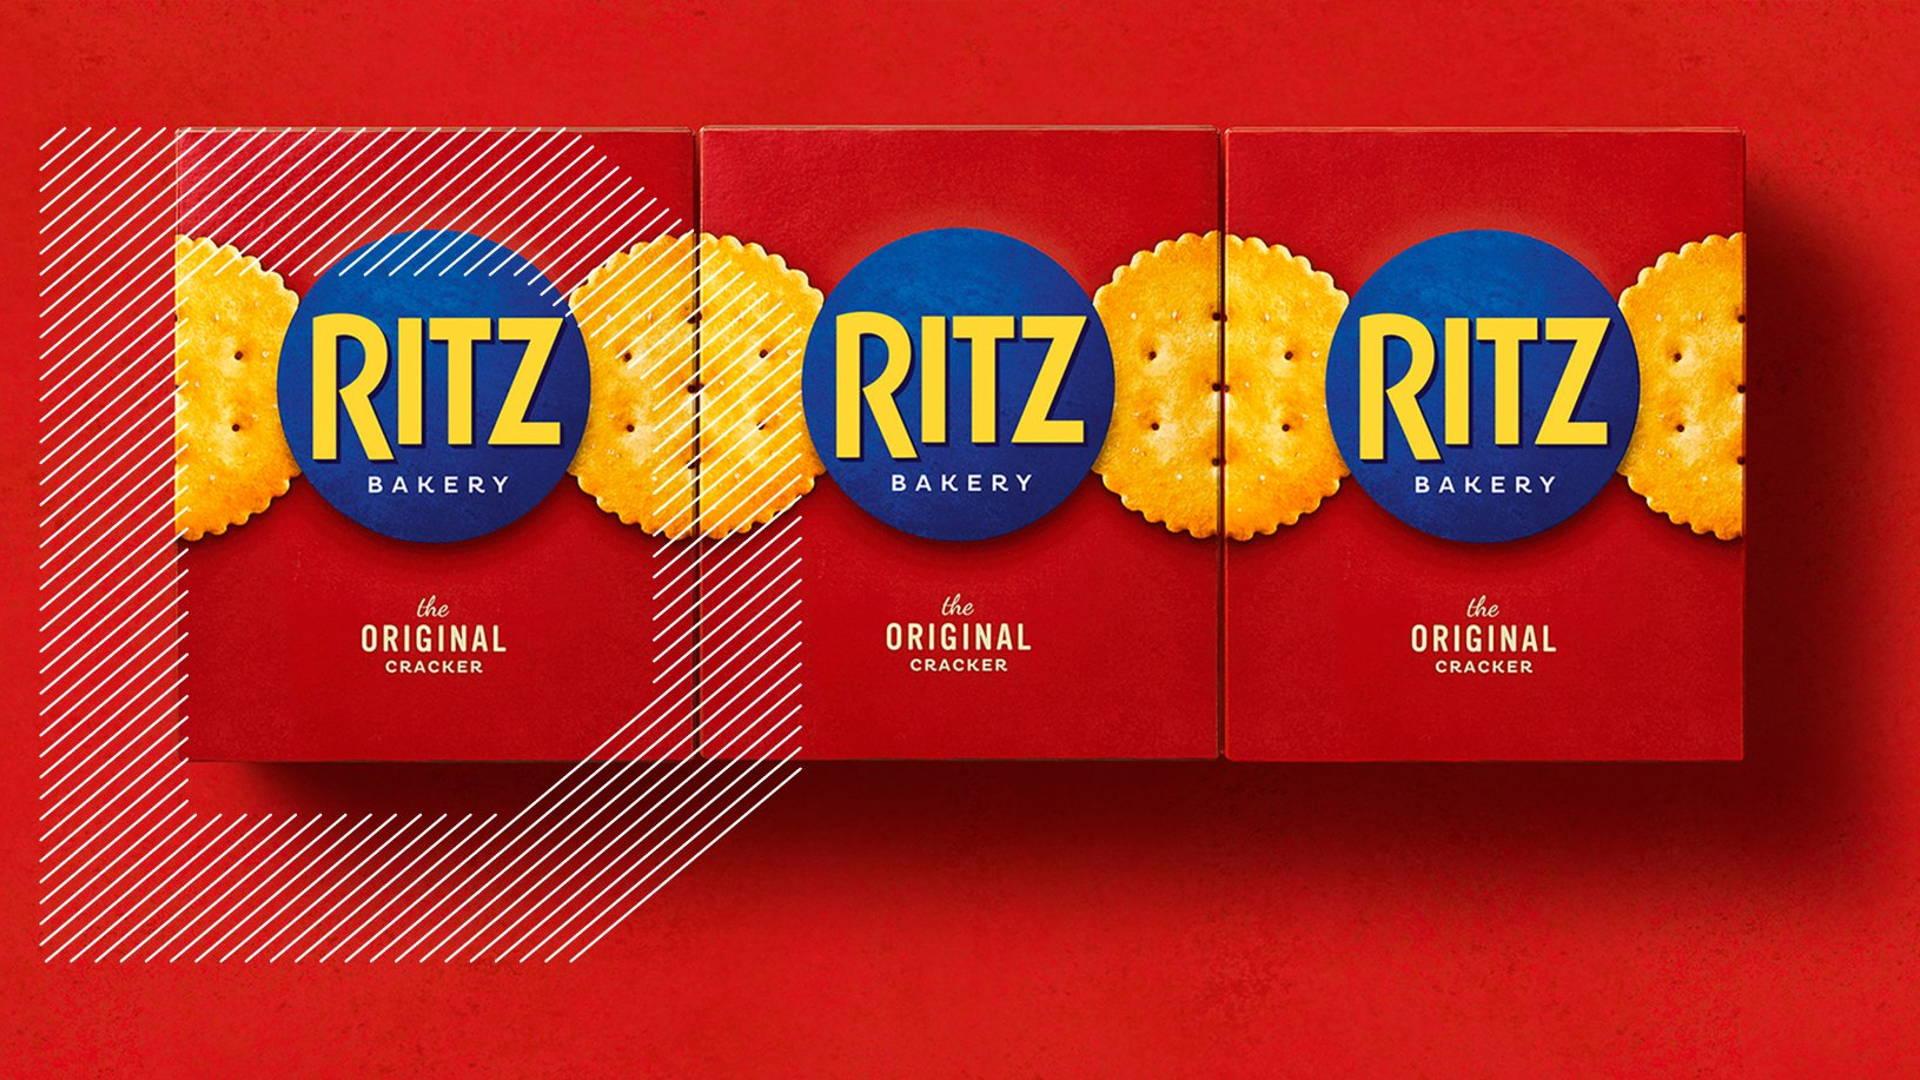 Superb Bulletproof Keeps Putting The Glitz Back In Ritz Dieline Download Free Architecture Designs Crovemadebymaigaardcom